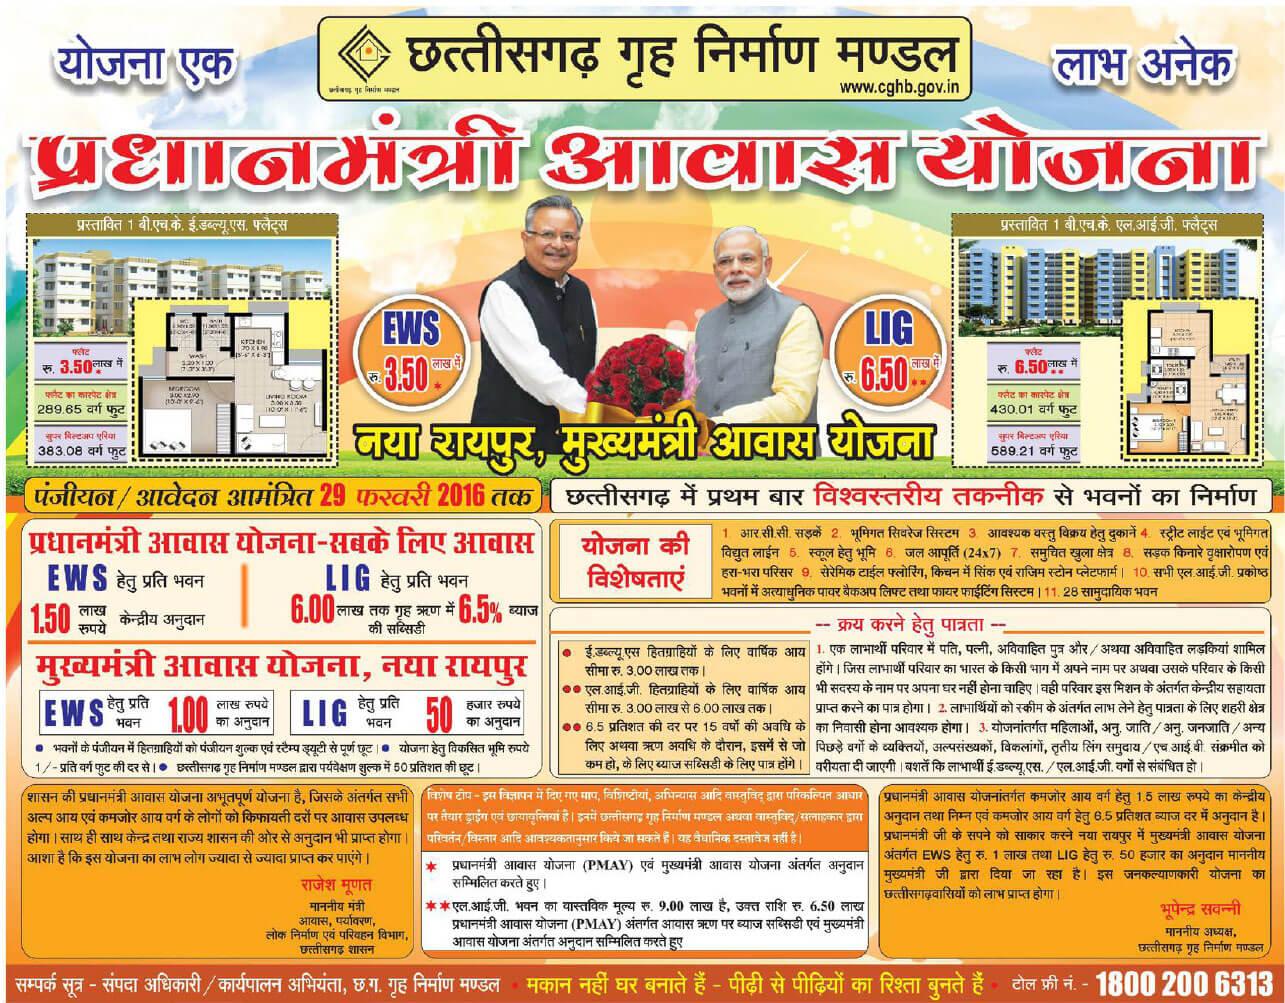 CGHB Pradhan Mantri Awas Yojana and Mukhya Mantri Awas Yojana